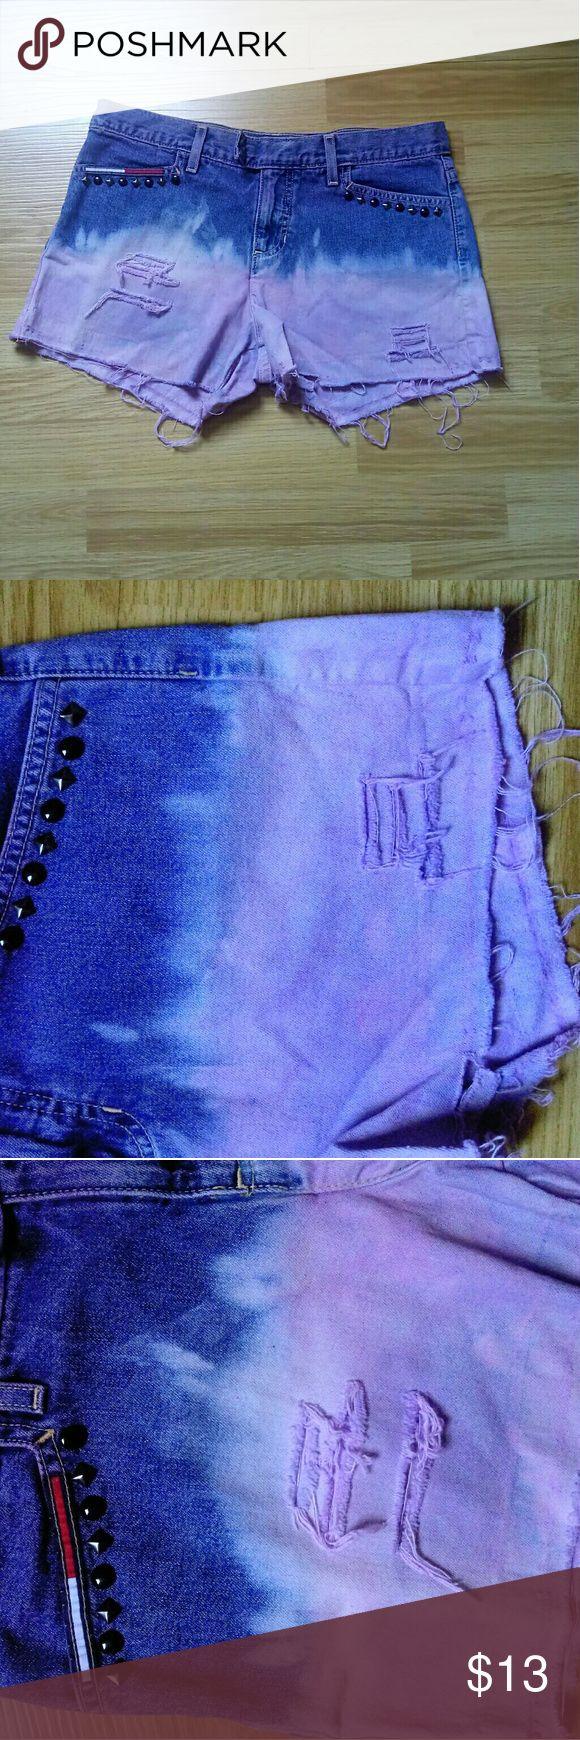 Tommy Hilfiger shorts Tommy Hilfiger tie dye ripped studded jean juniors shorts Tommy Hilfiger Shorts